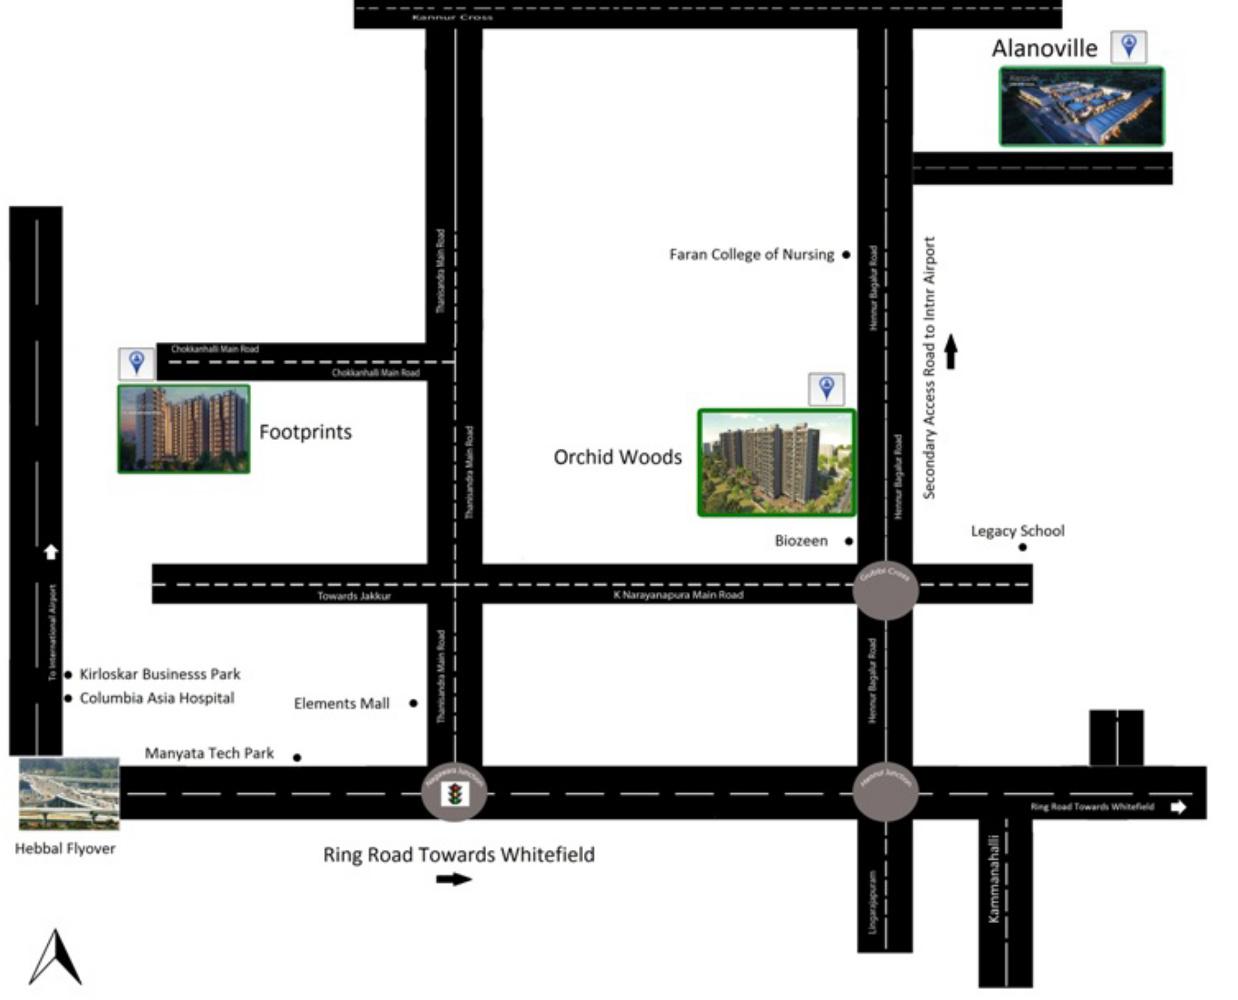 Sch 252 co upvc windows german quality - Goyal Footprints By Goyal And Co Hariyana Group In Jakkur Bangalore Price Location Map Floor Plan Reviews Proptiger Com